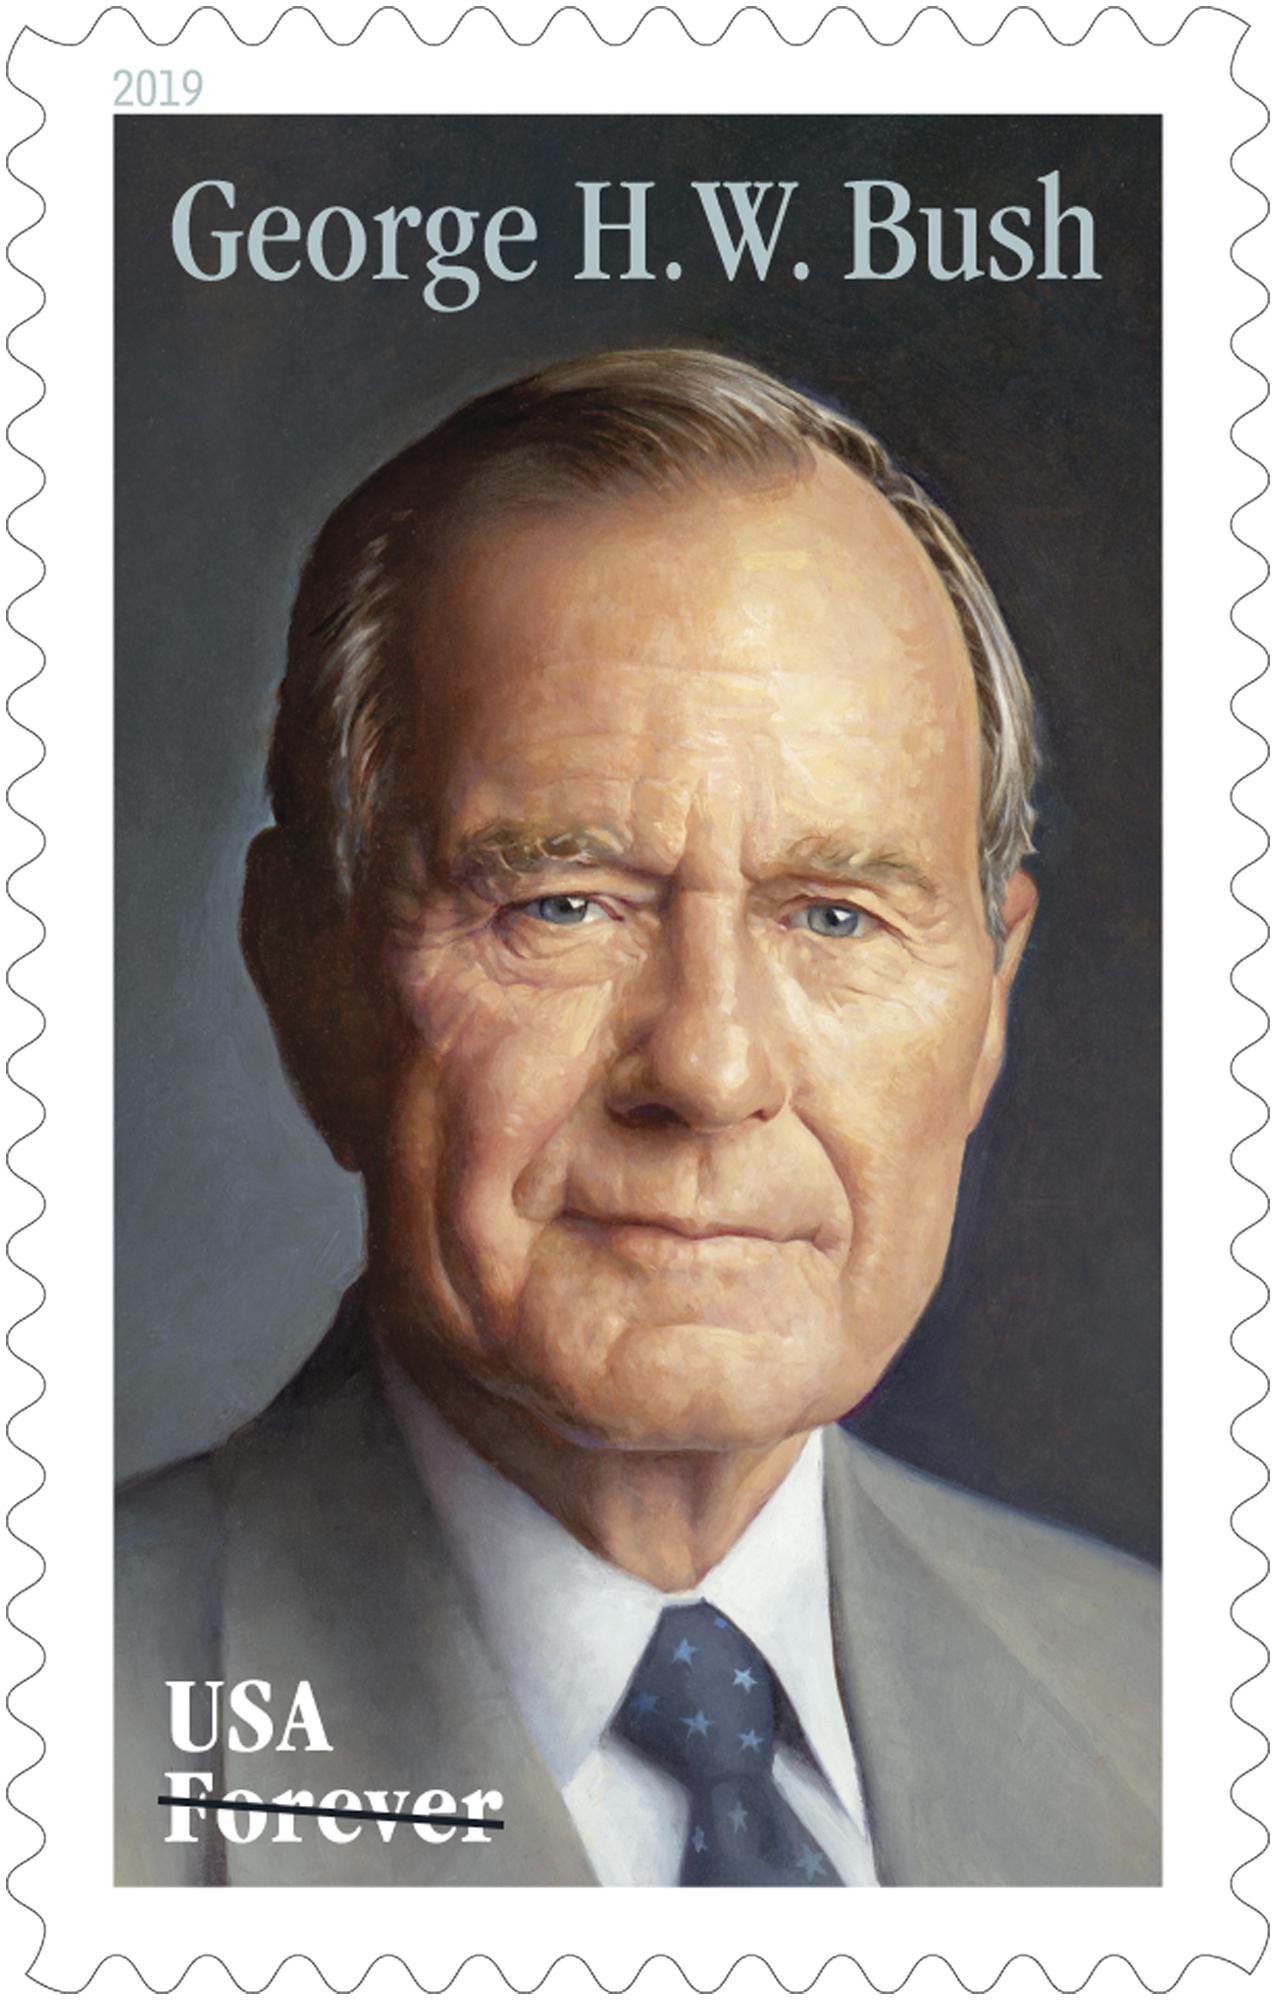 George HW Bush Stamp_1560371233213